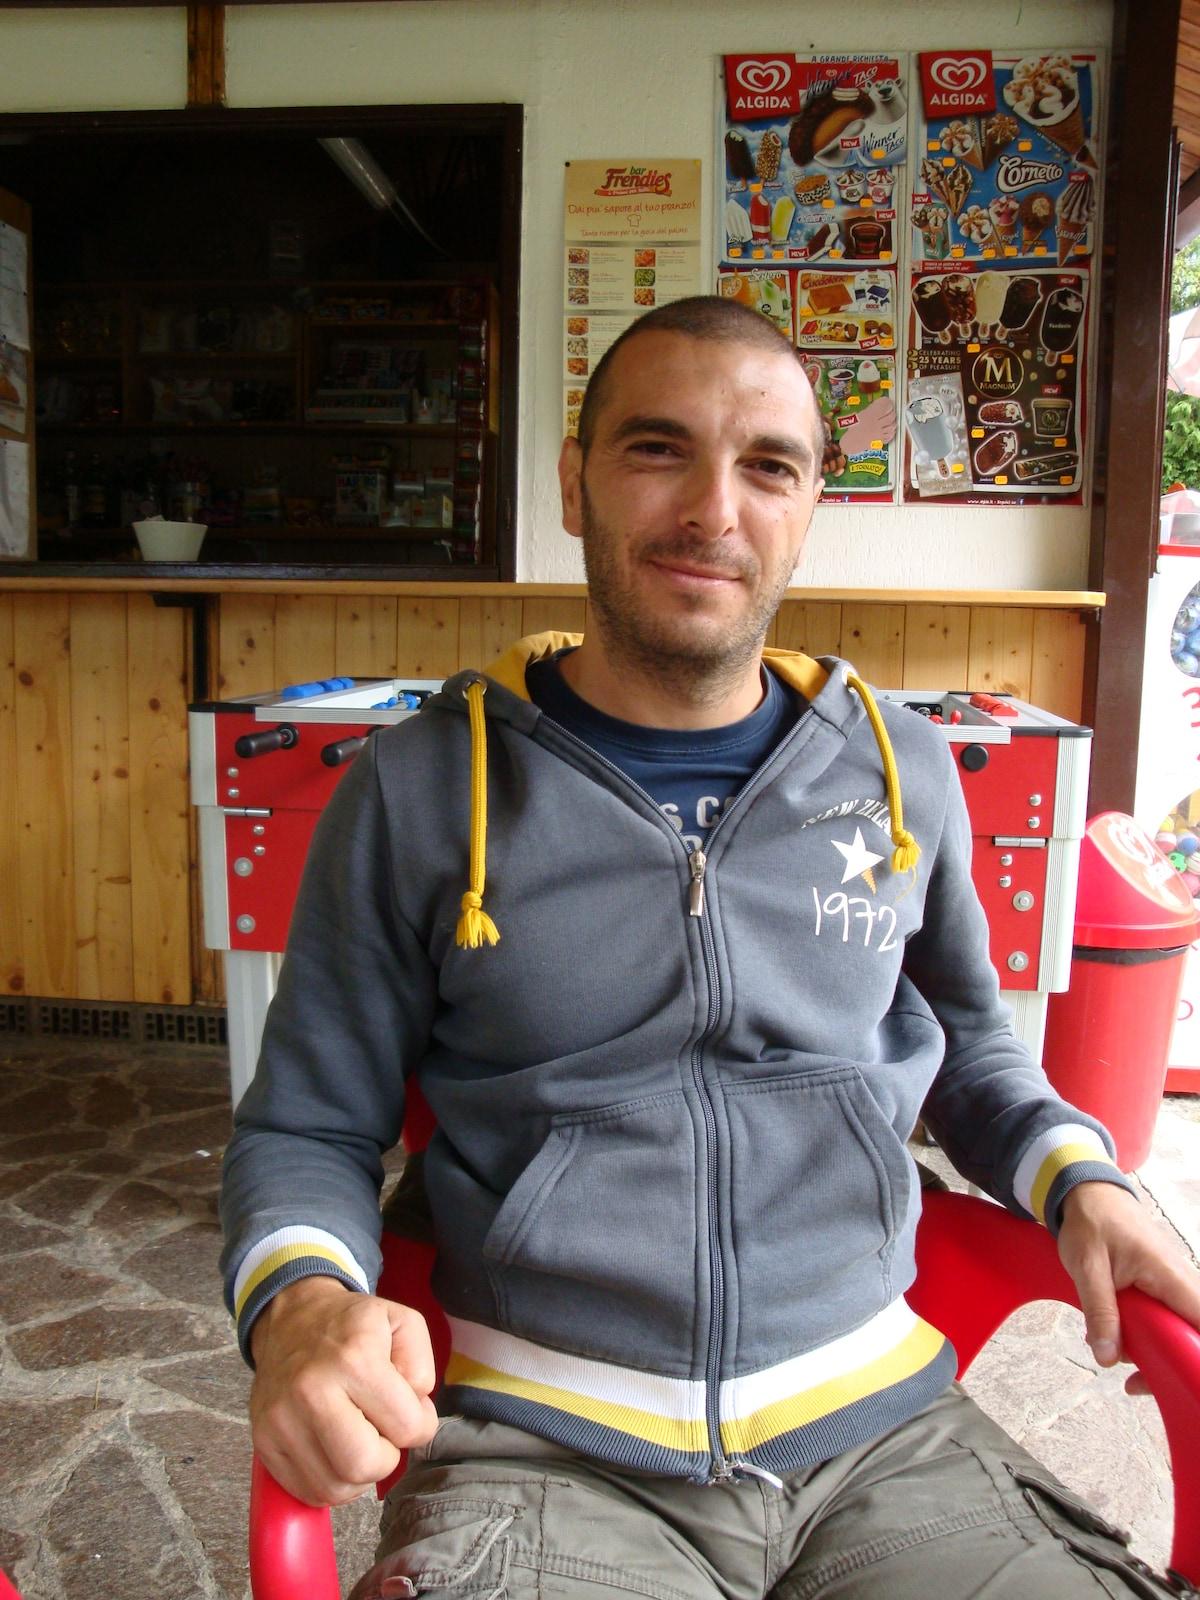 Davide from Villalago